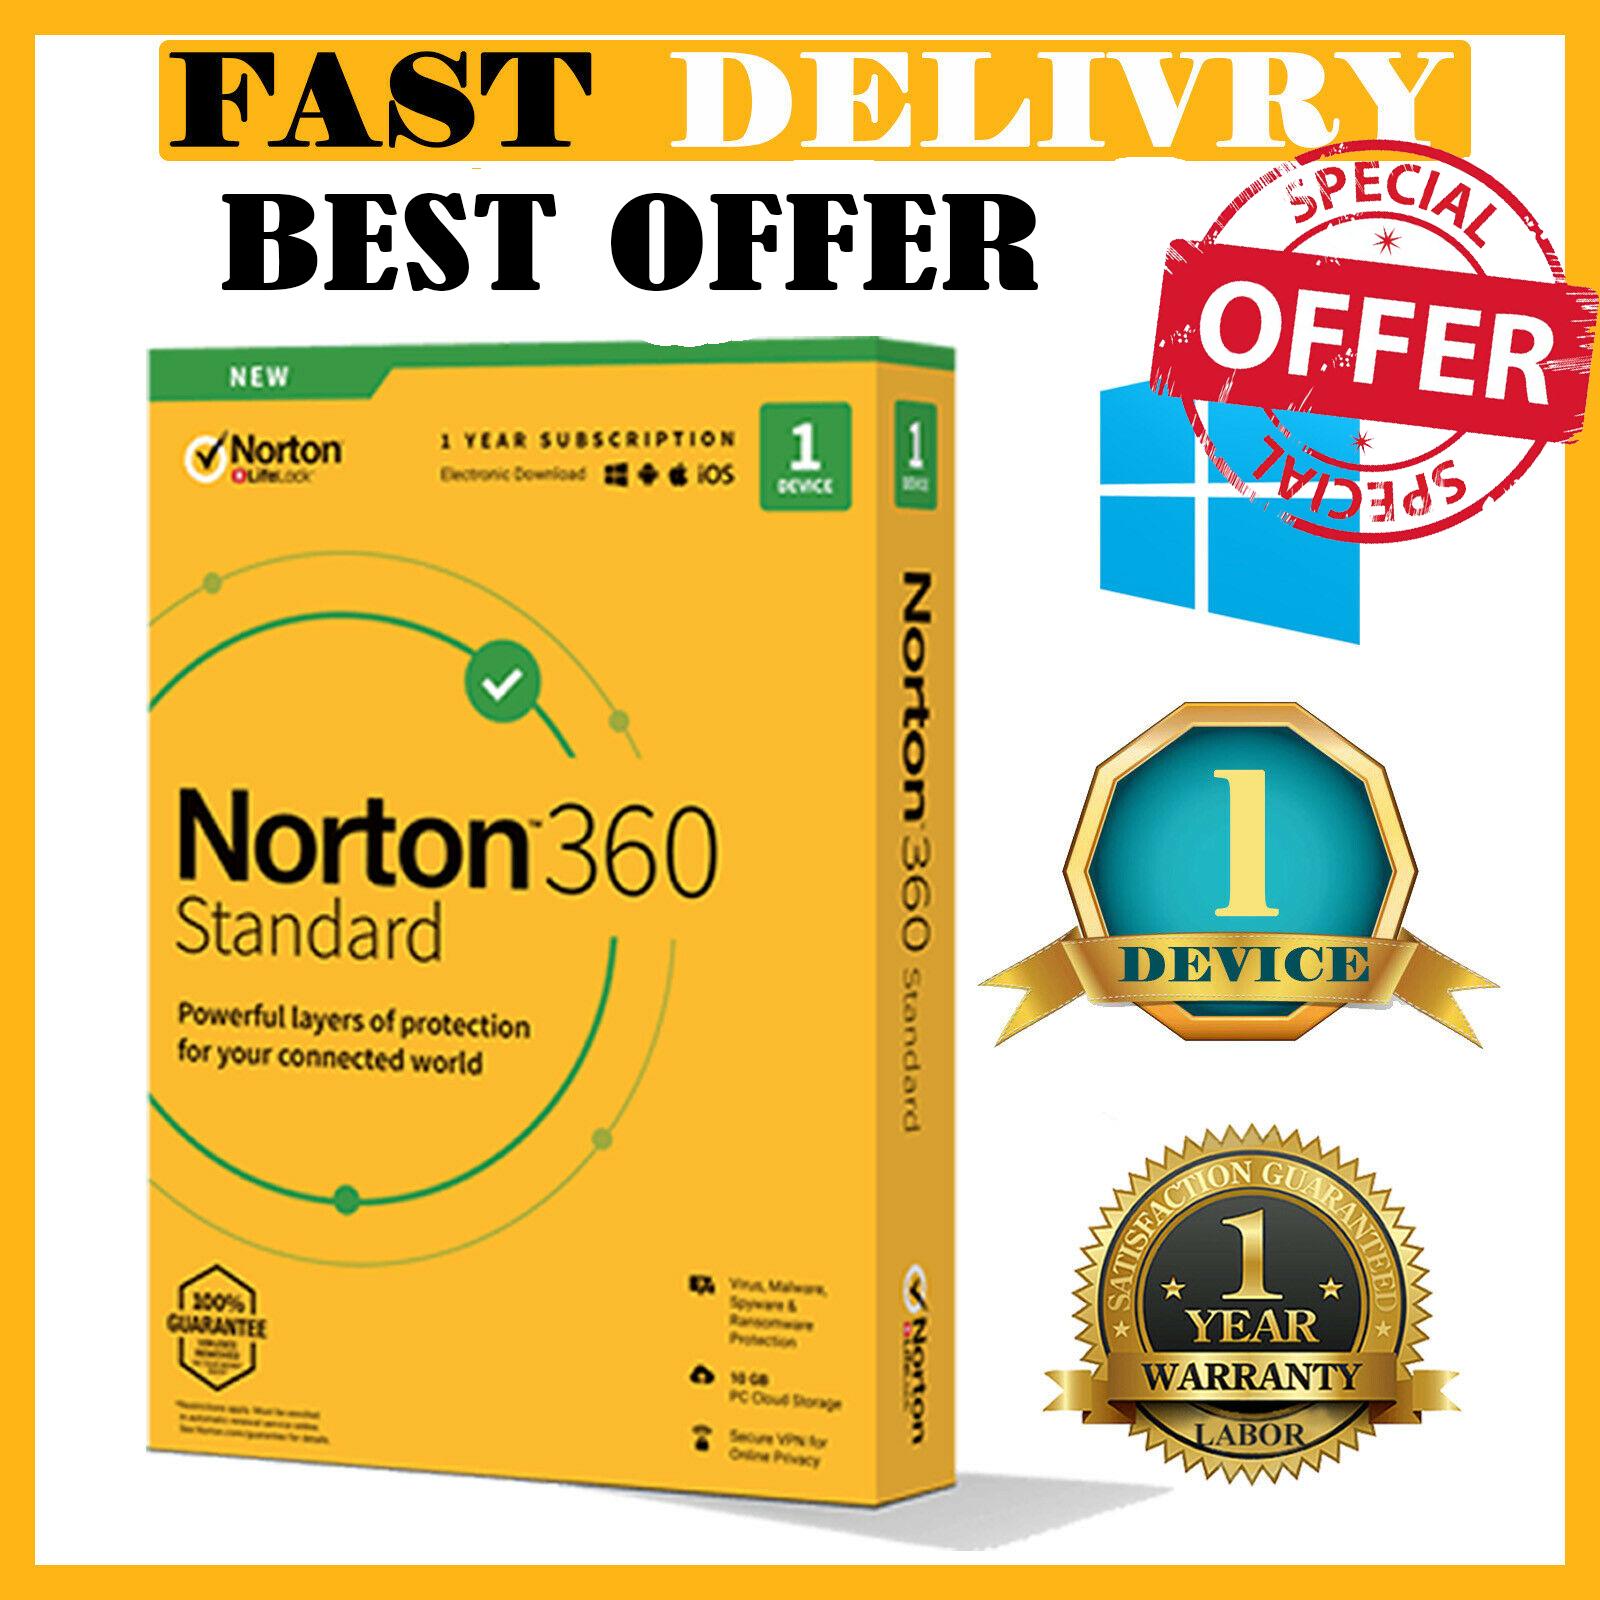 Norton Free Trials | FREE Downloads | Norton Official Site